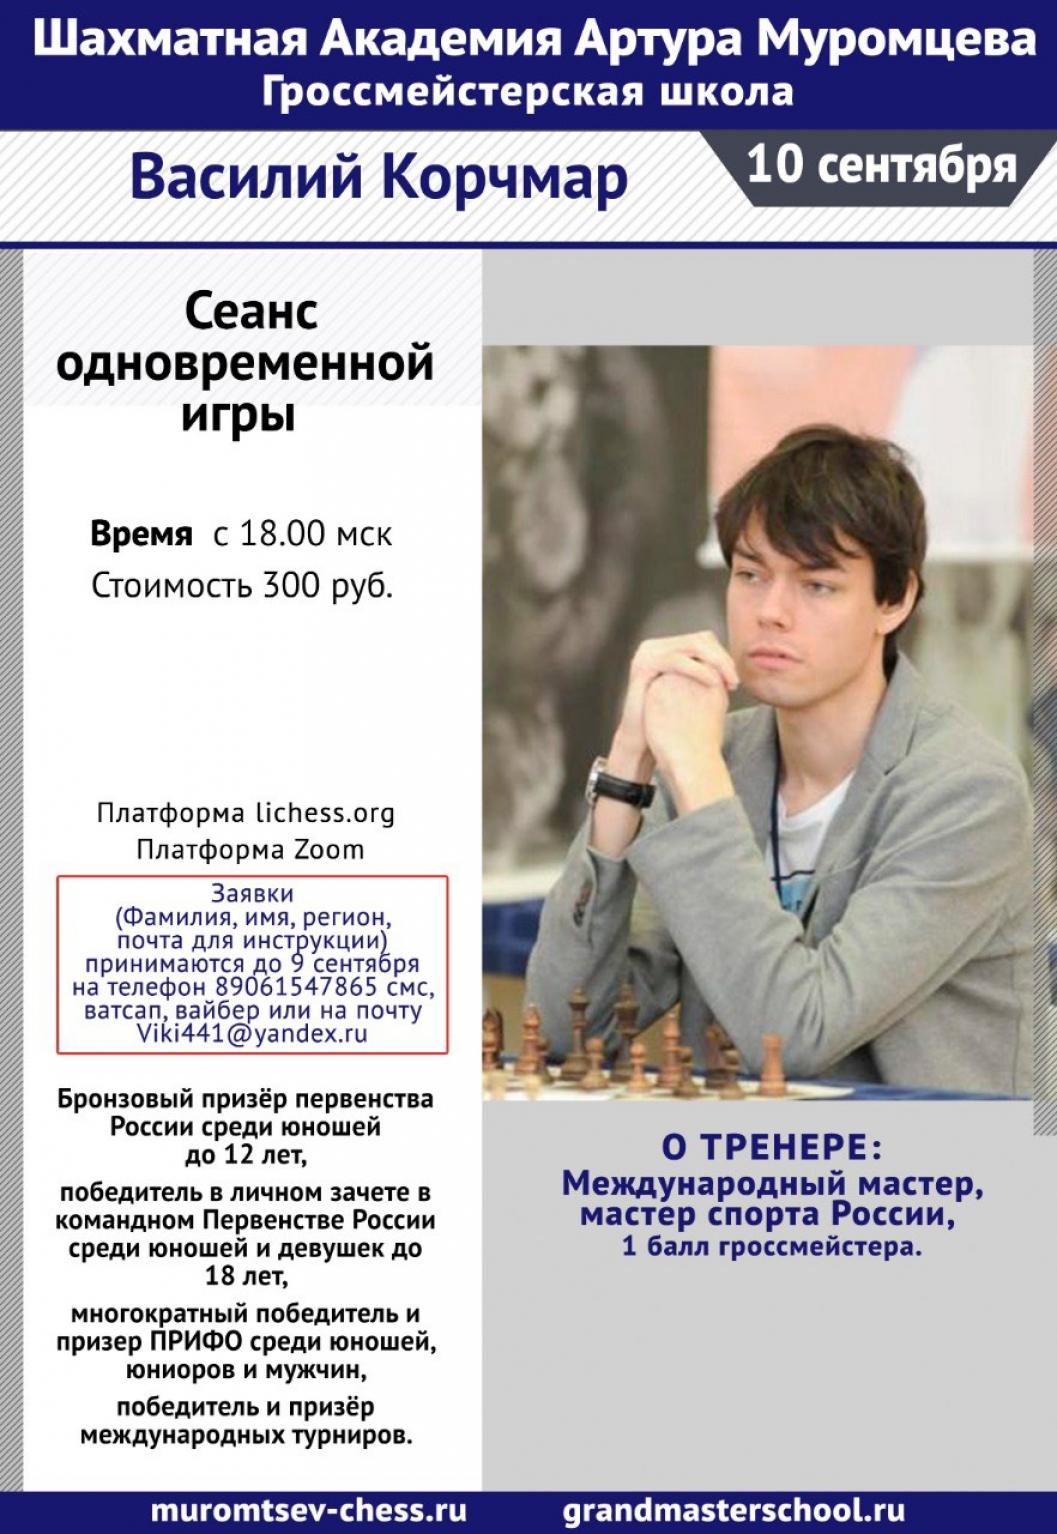 Василий Корчмар